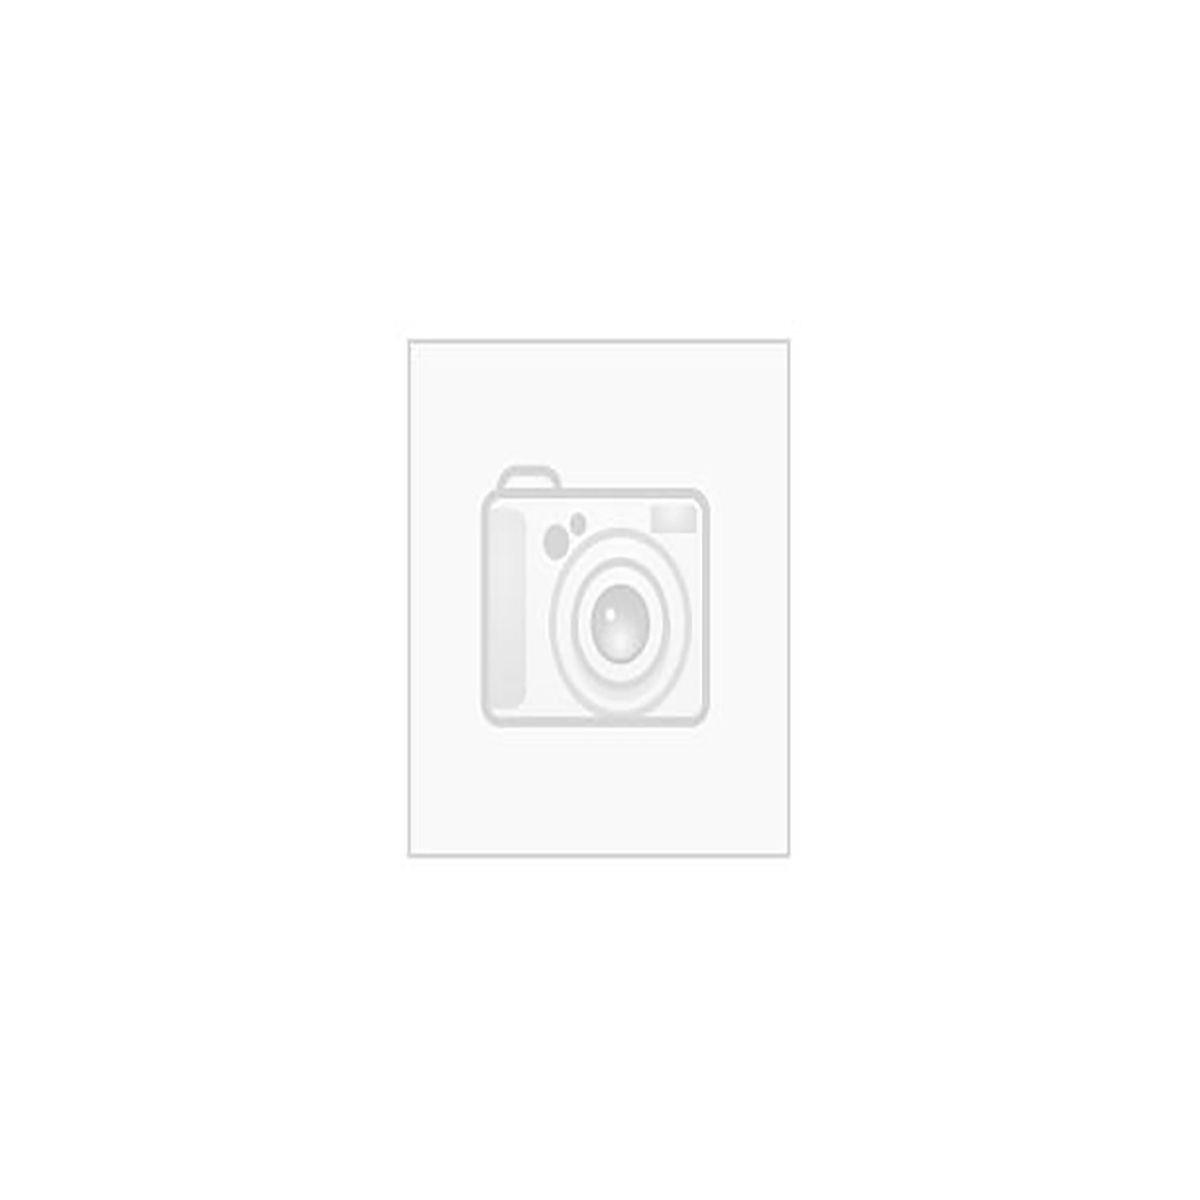 Klosettsete Pressalit Basic, hvit